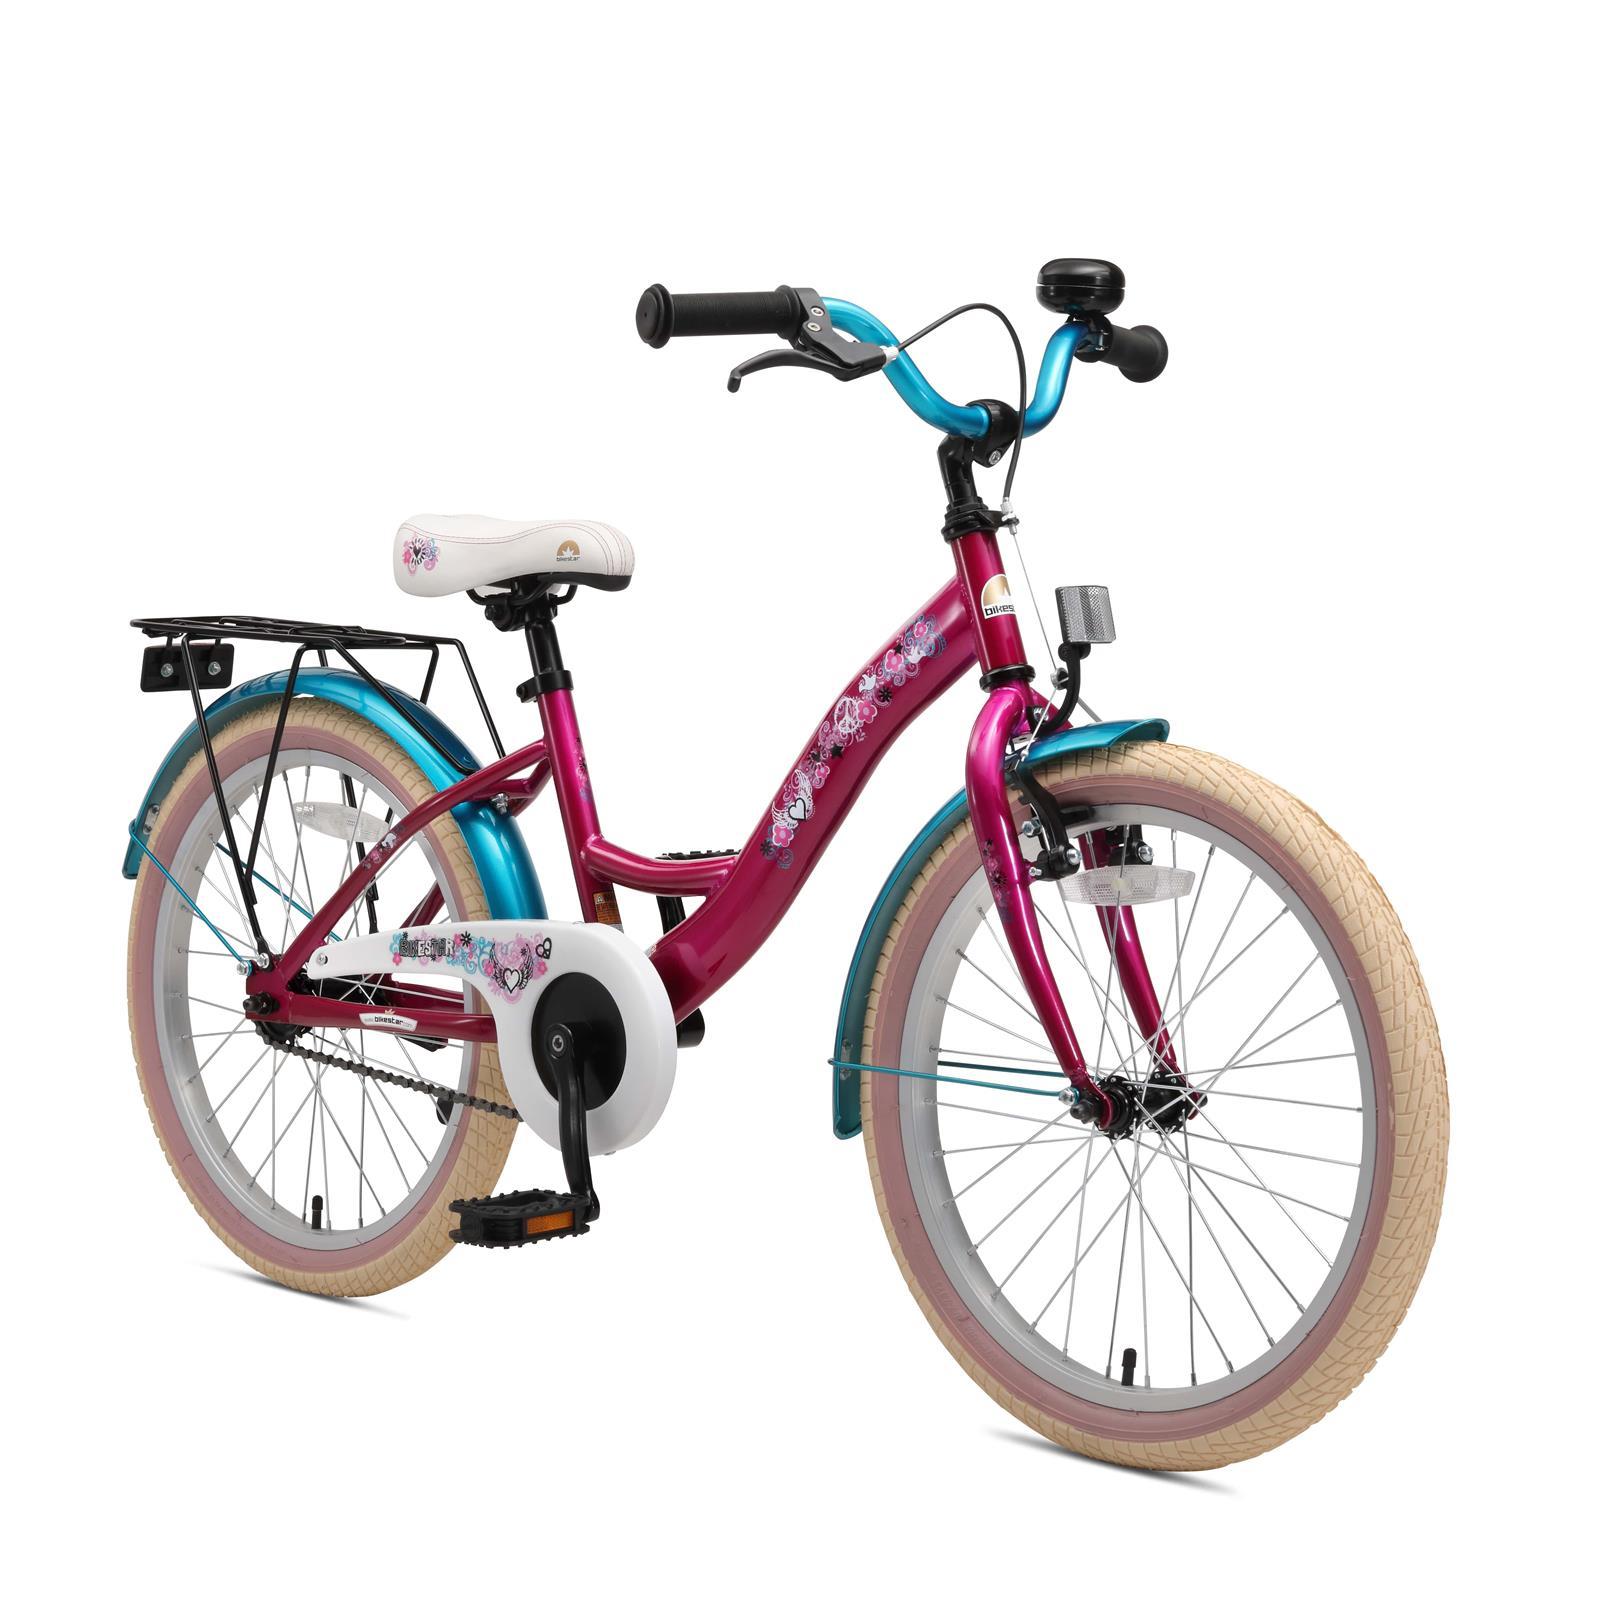 bi 20 kk 01 pete bikestar 20 zoll kinderfahrrad berry t rkis. Black Bedroom Furniture Sets. Home Design Ideas